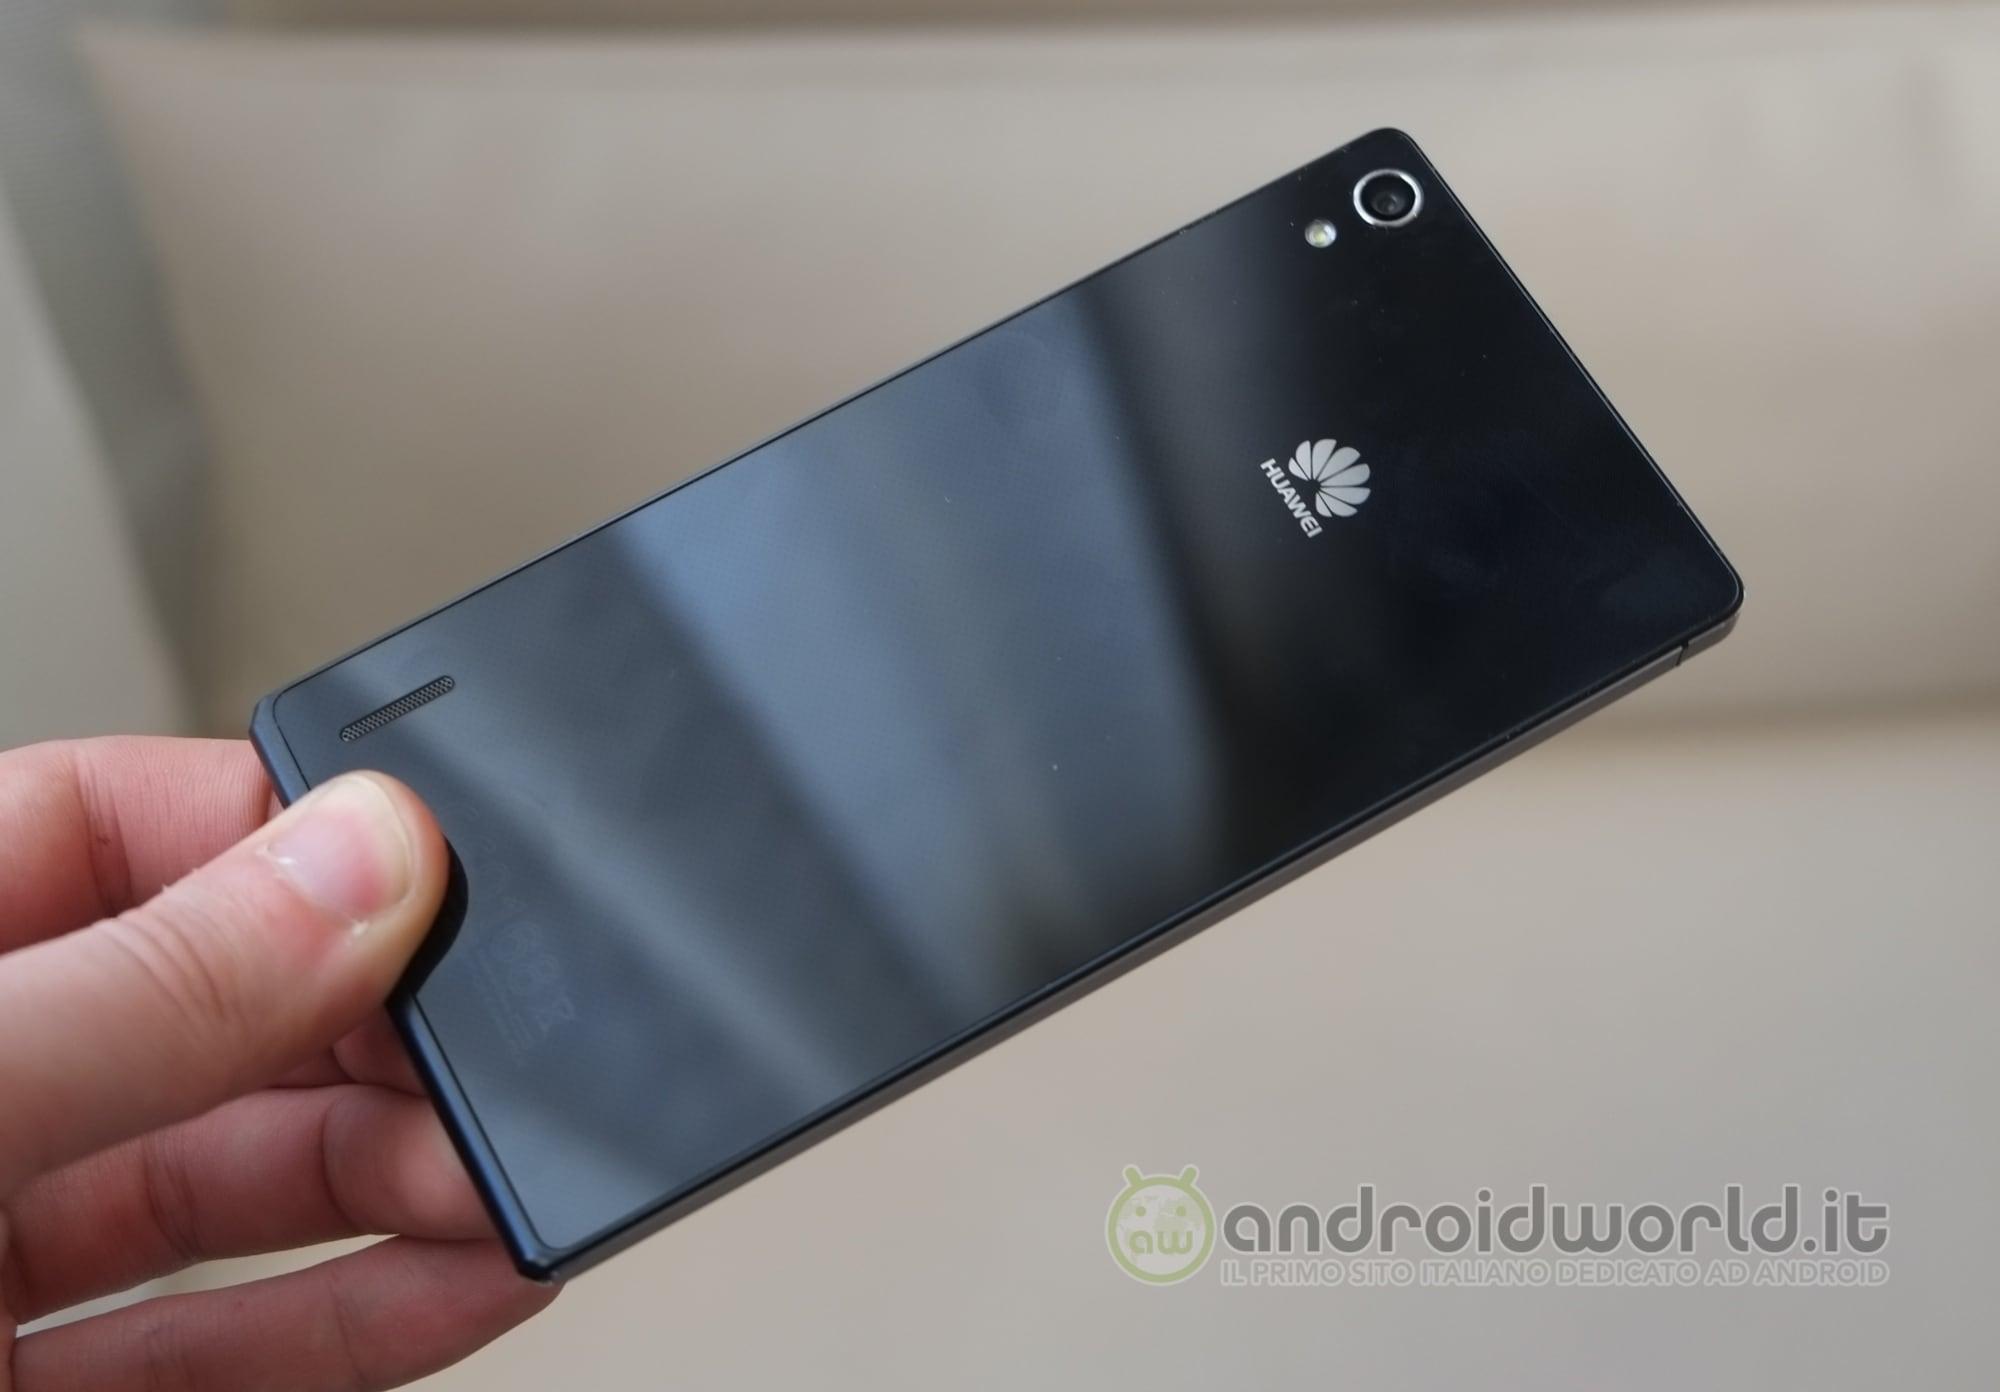 Huawei Ascend P7 13